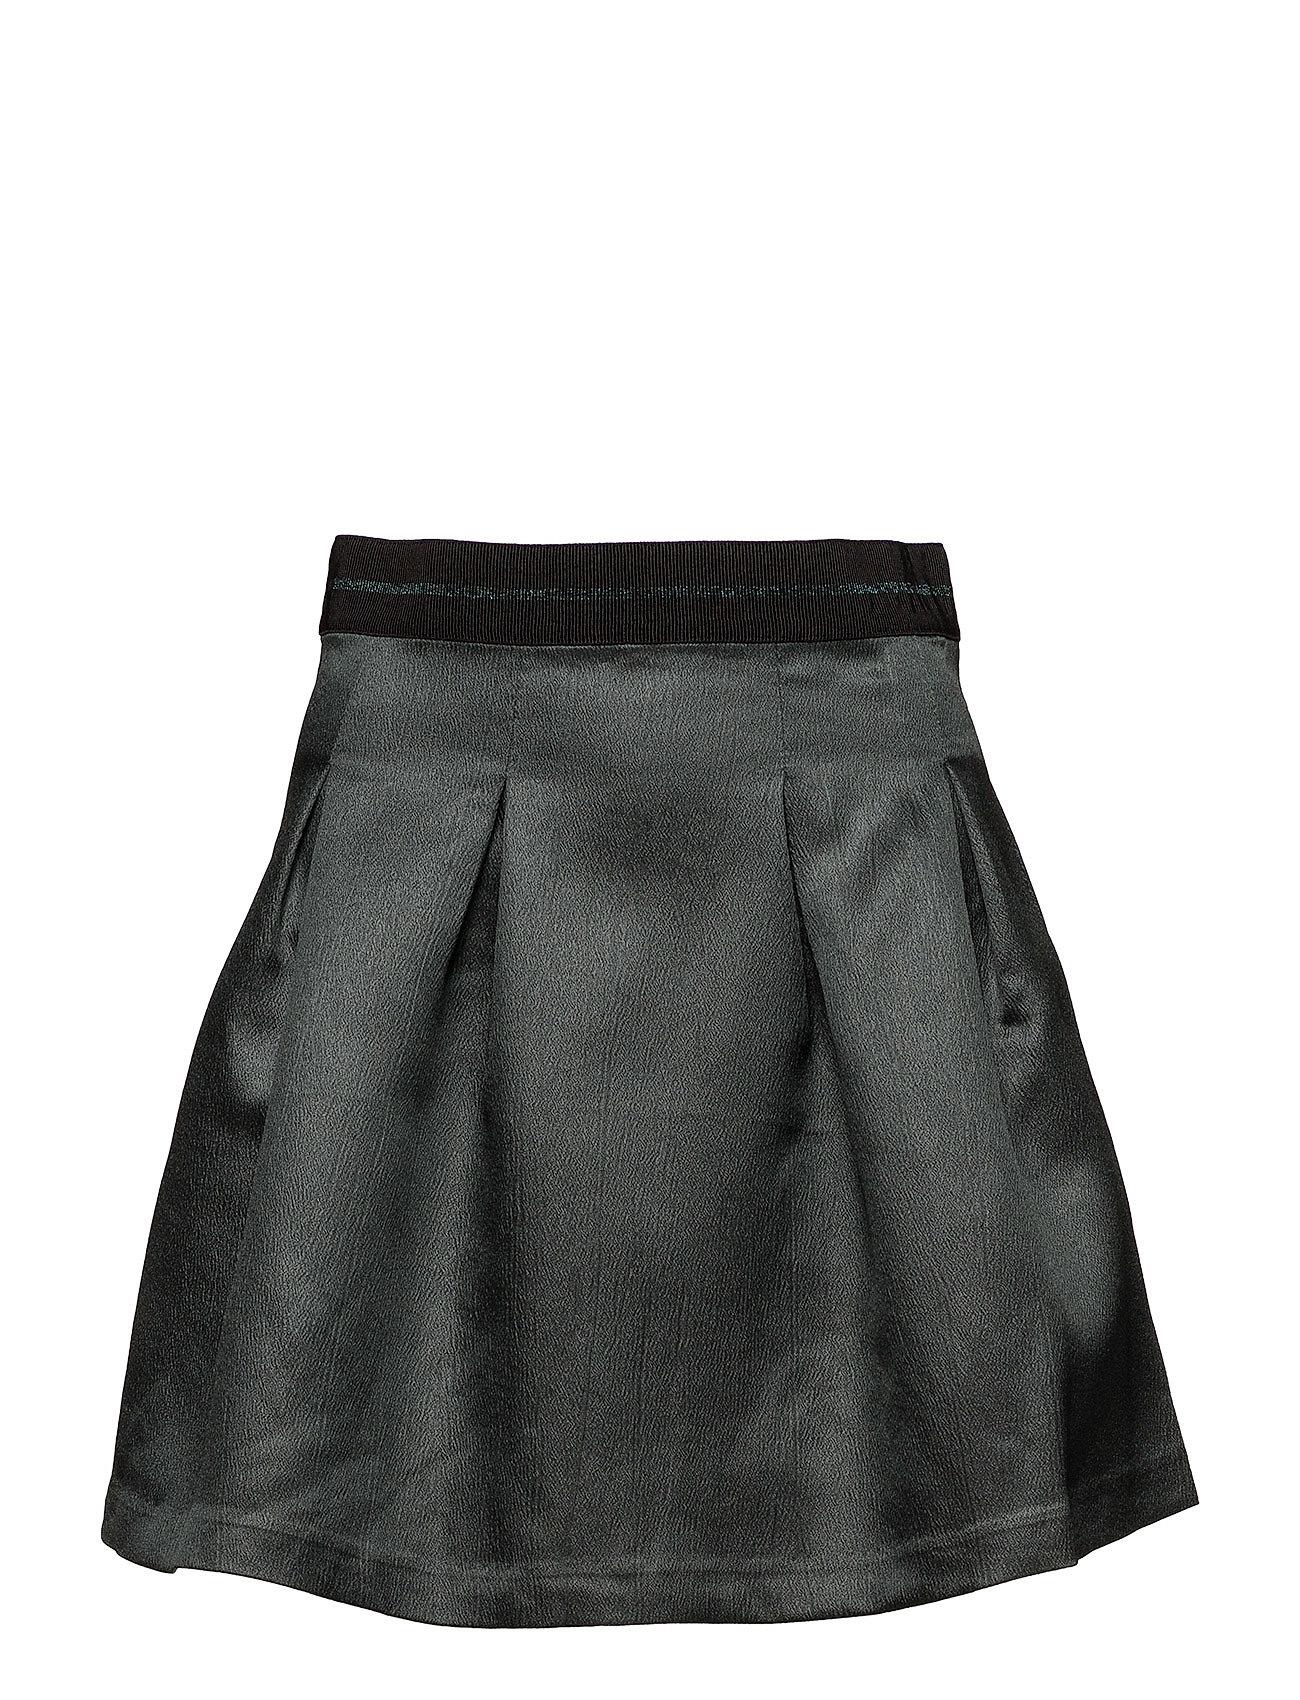 Image of Onleva Metallic Skirt Tlr Kort Nederdel Sort ONLY (3413095291)